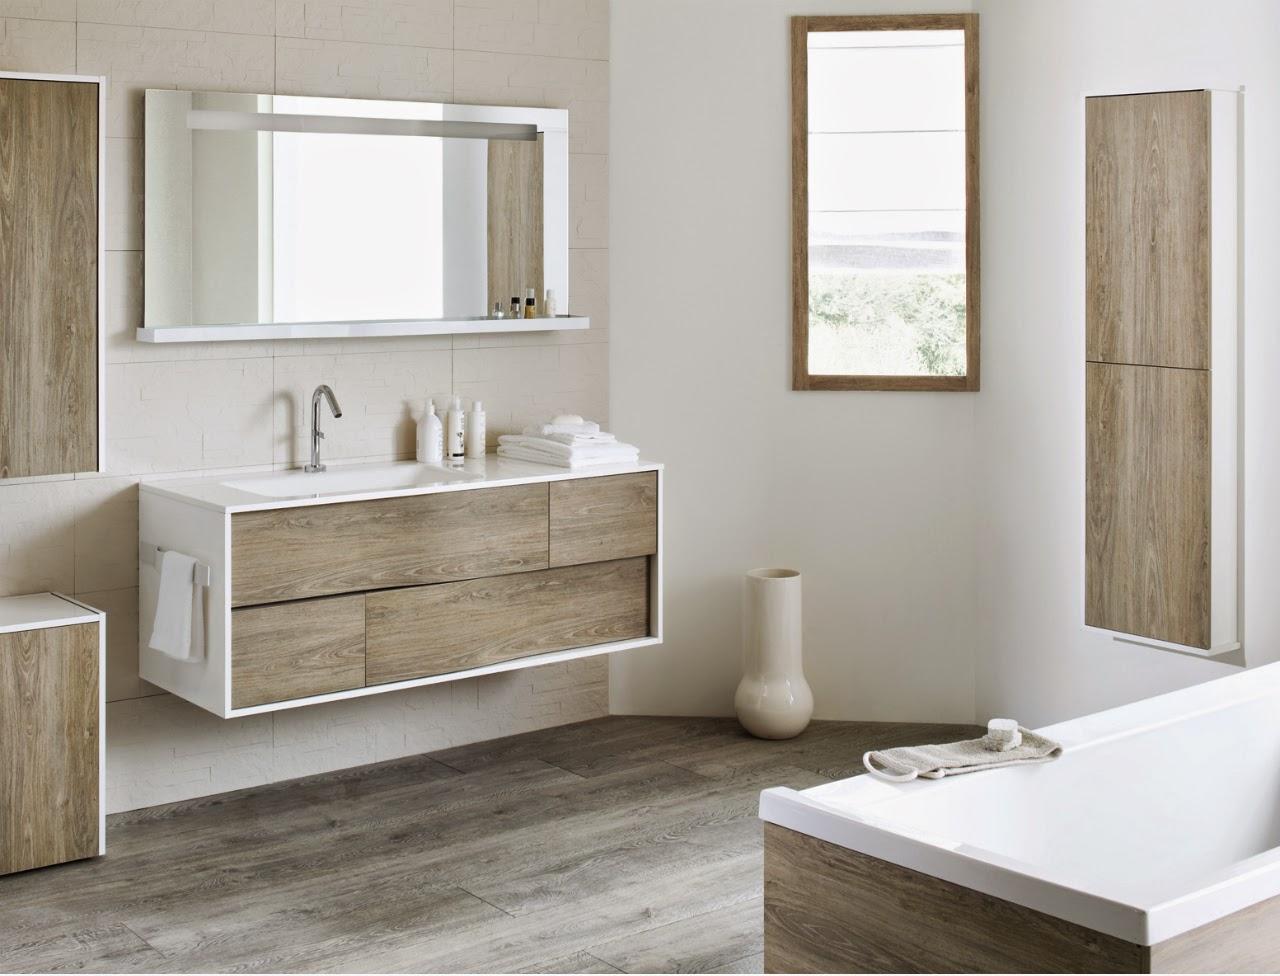 Plan De Travail Salle De Bain Ikea Impressionnant Photographie Meuble De Sdb 10 Salle Bain Ikea Godmorgon 2 1280x976